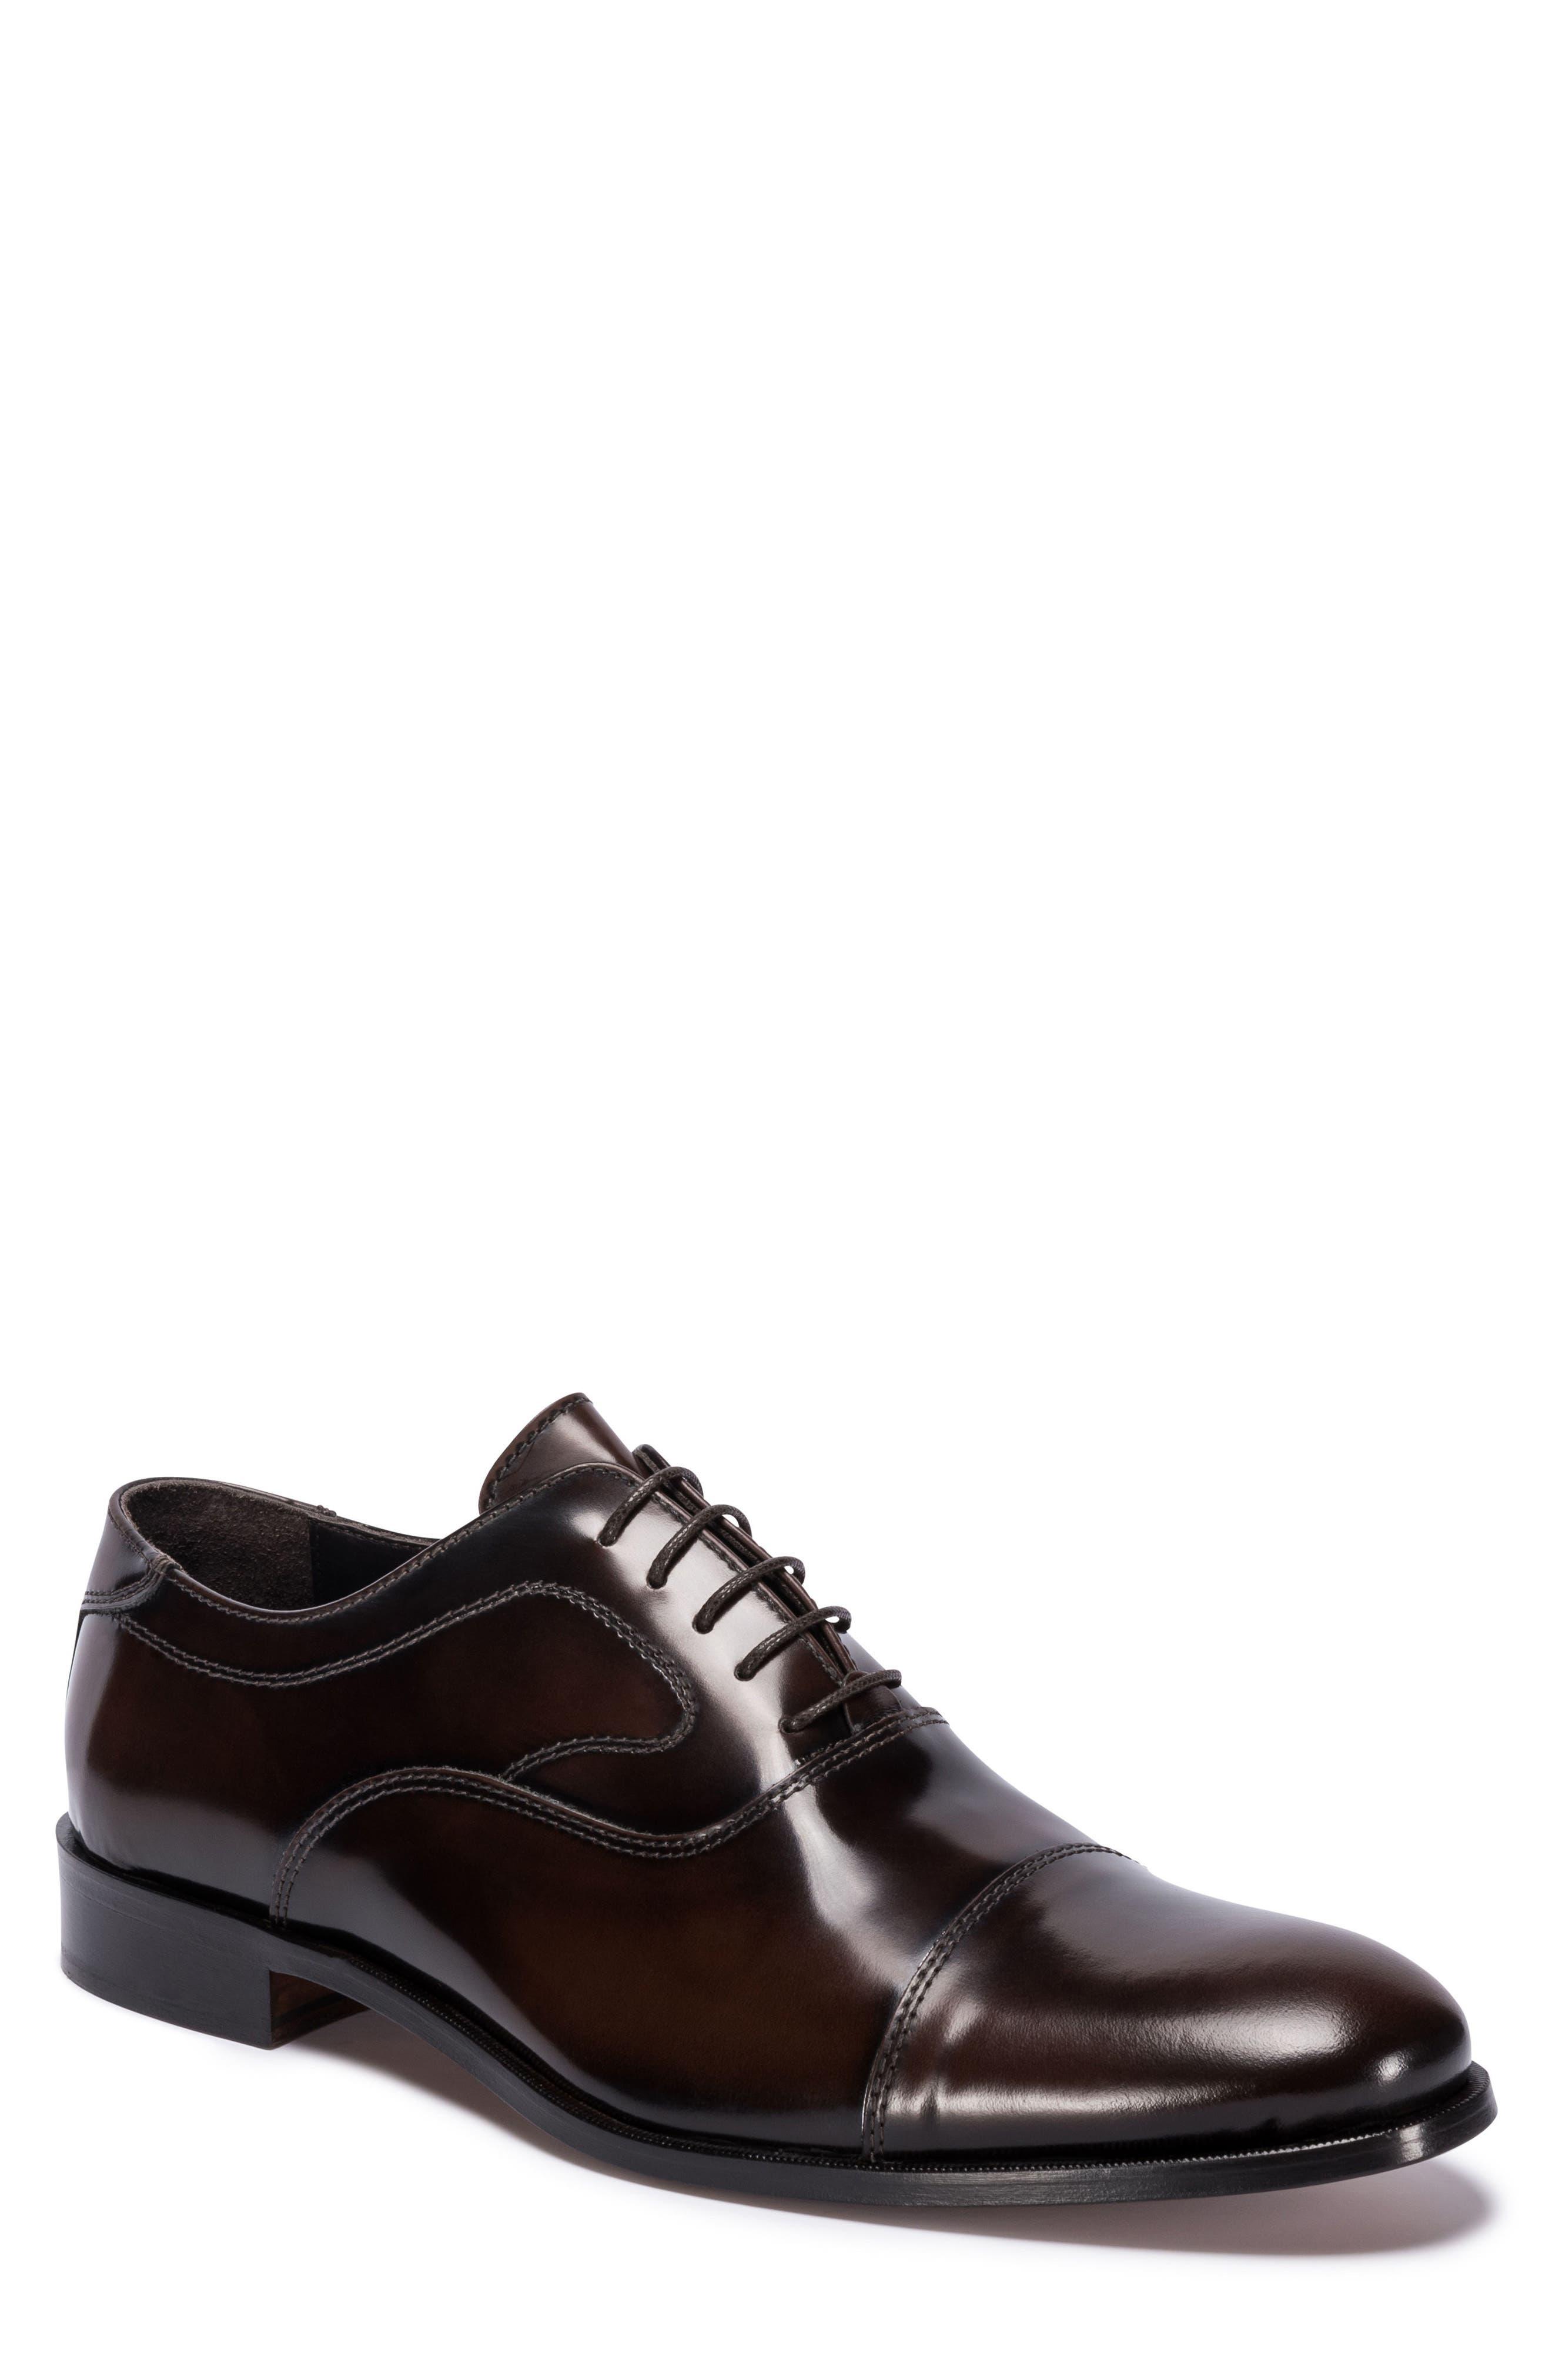 Garda Cap Toe Oxford,                             Main thumbnail 1, color,                             Brown Leather